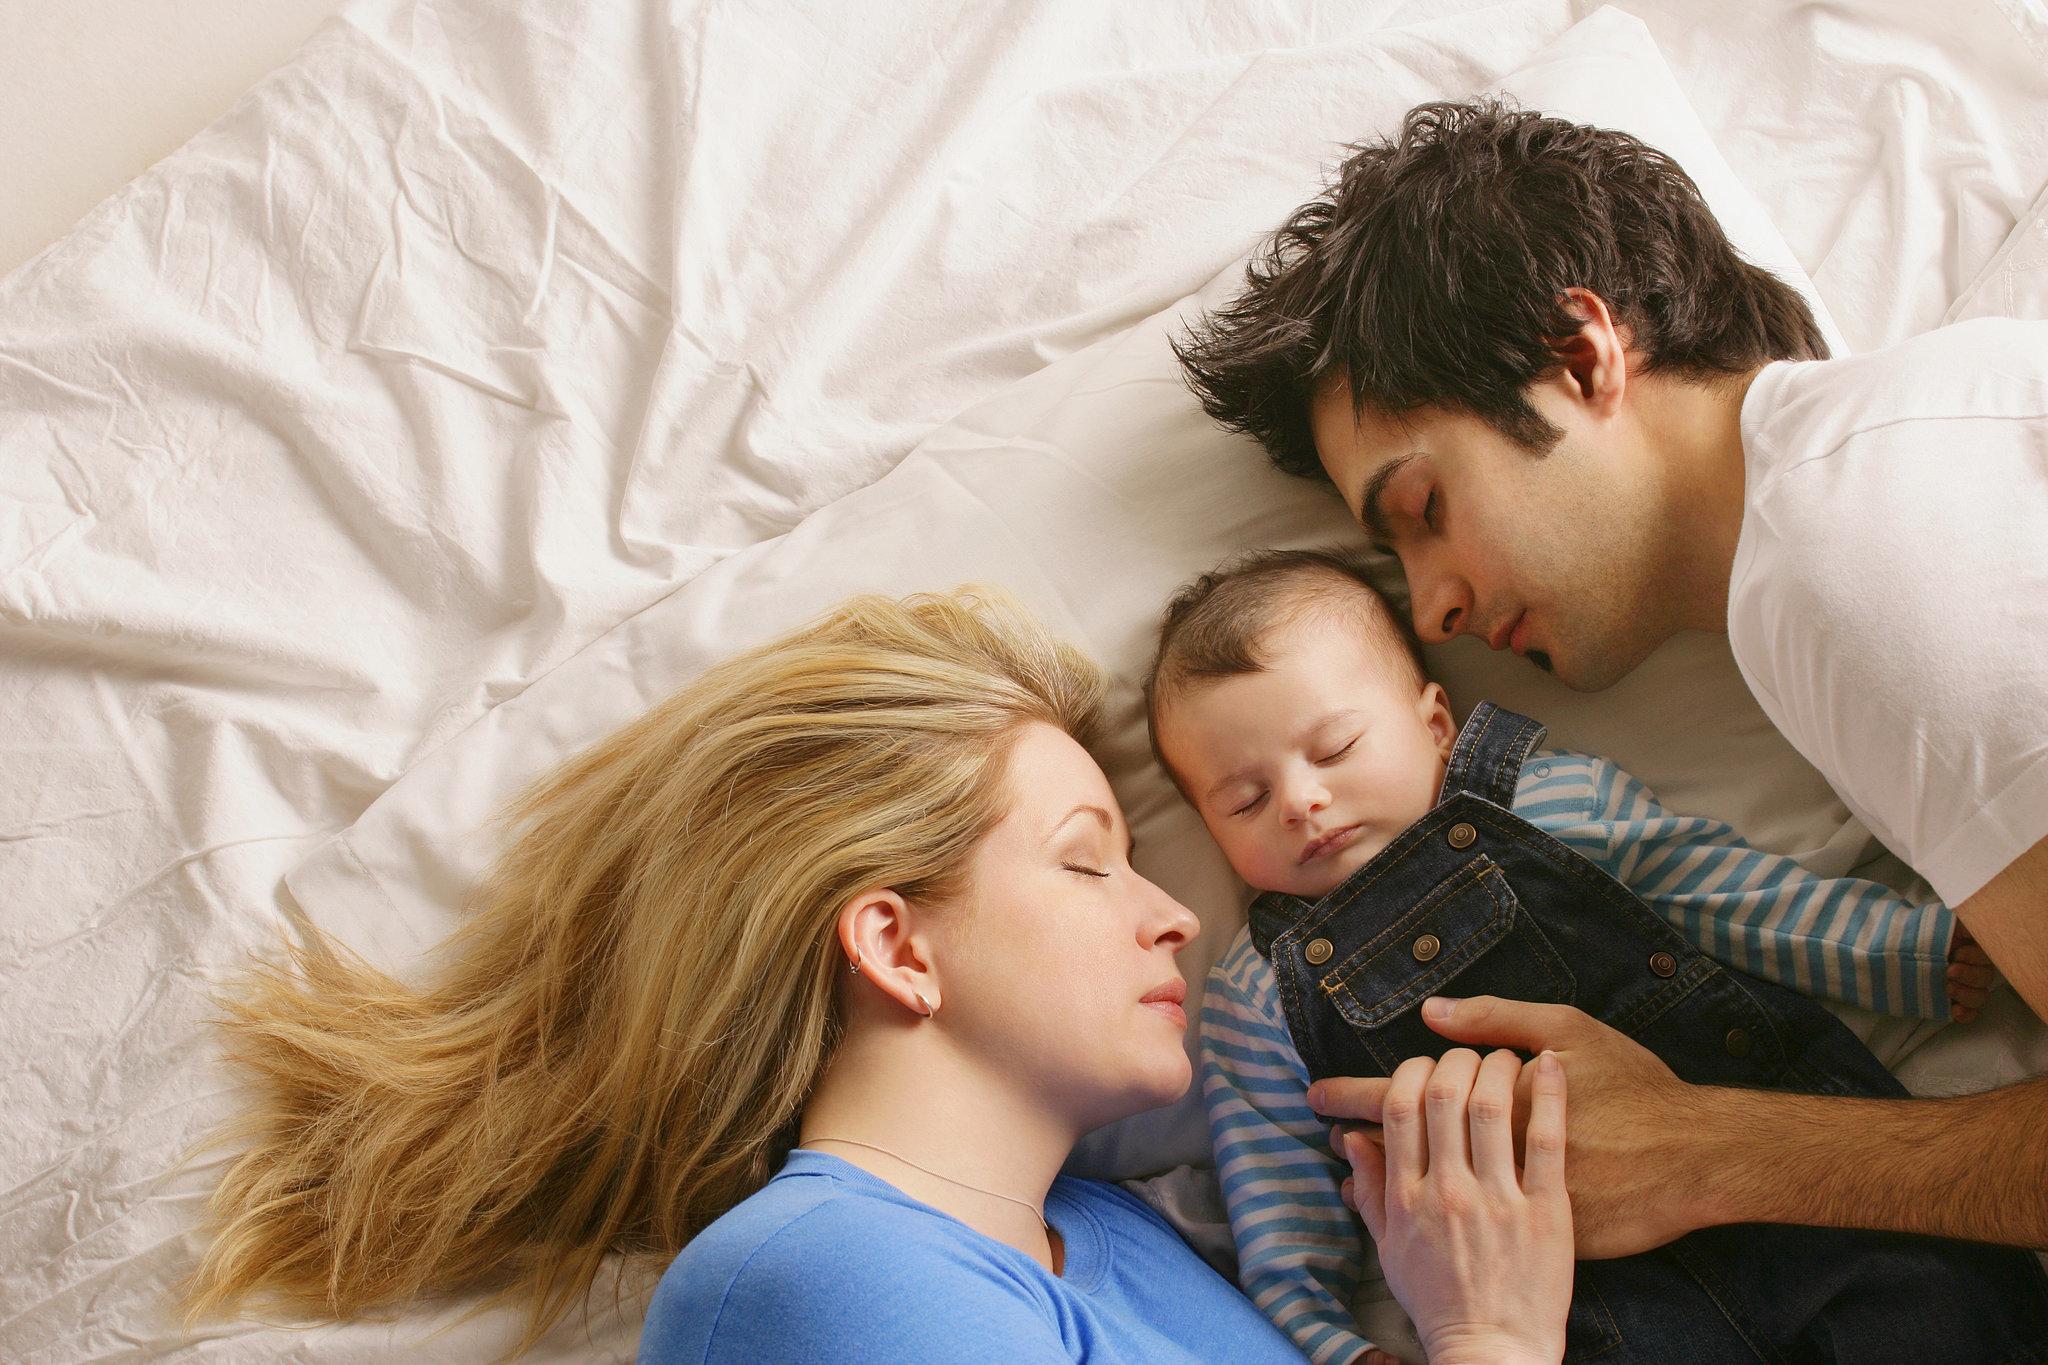 Why Cosleeping Hurts Marriage | POPSUGAR Moms